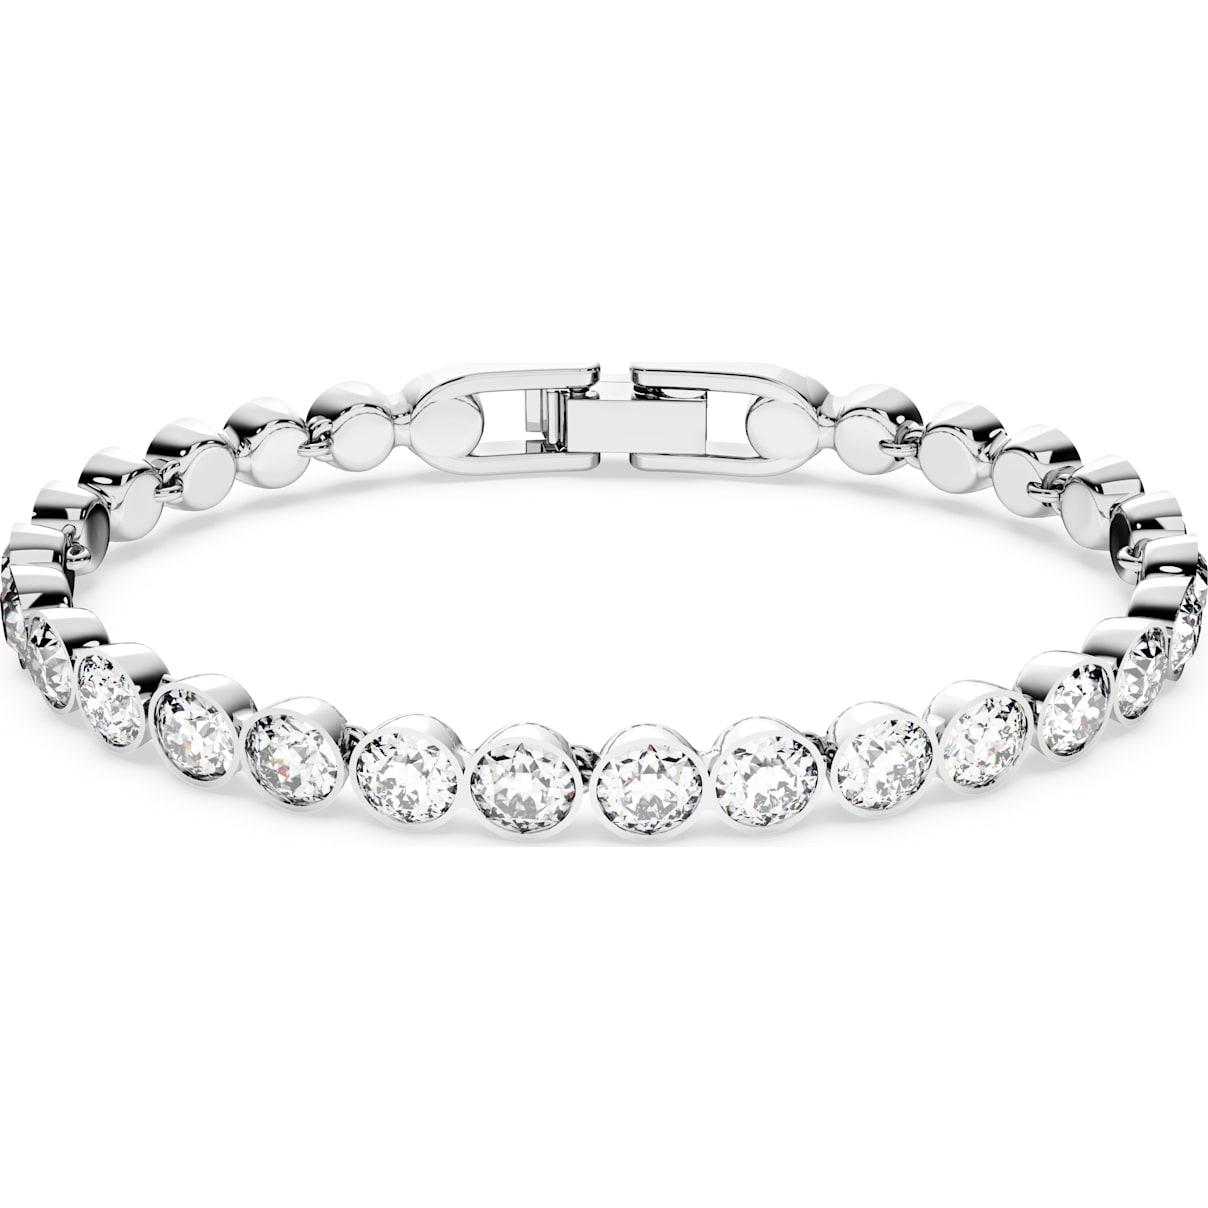 Swarovski Tennis Bracelet, White, Rhodium plated